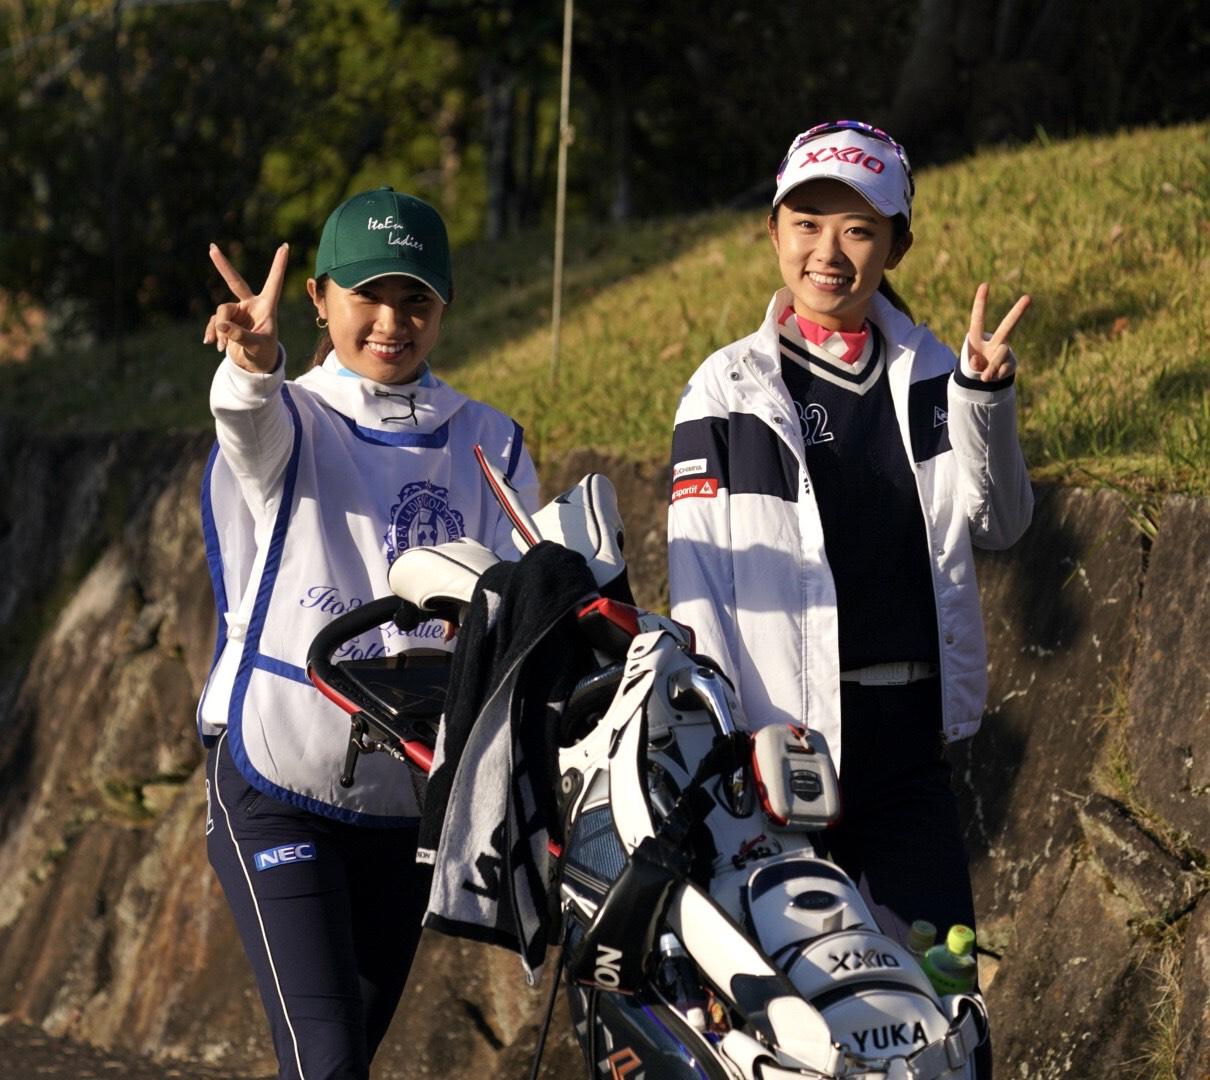 https://www.nikkansports.com/sports/golf/news/img/202011130000066-w1300_6.jpg